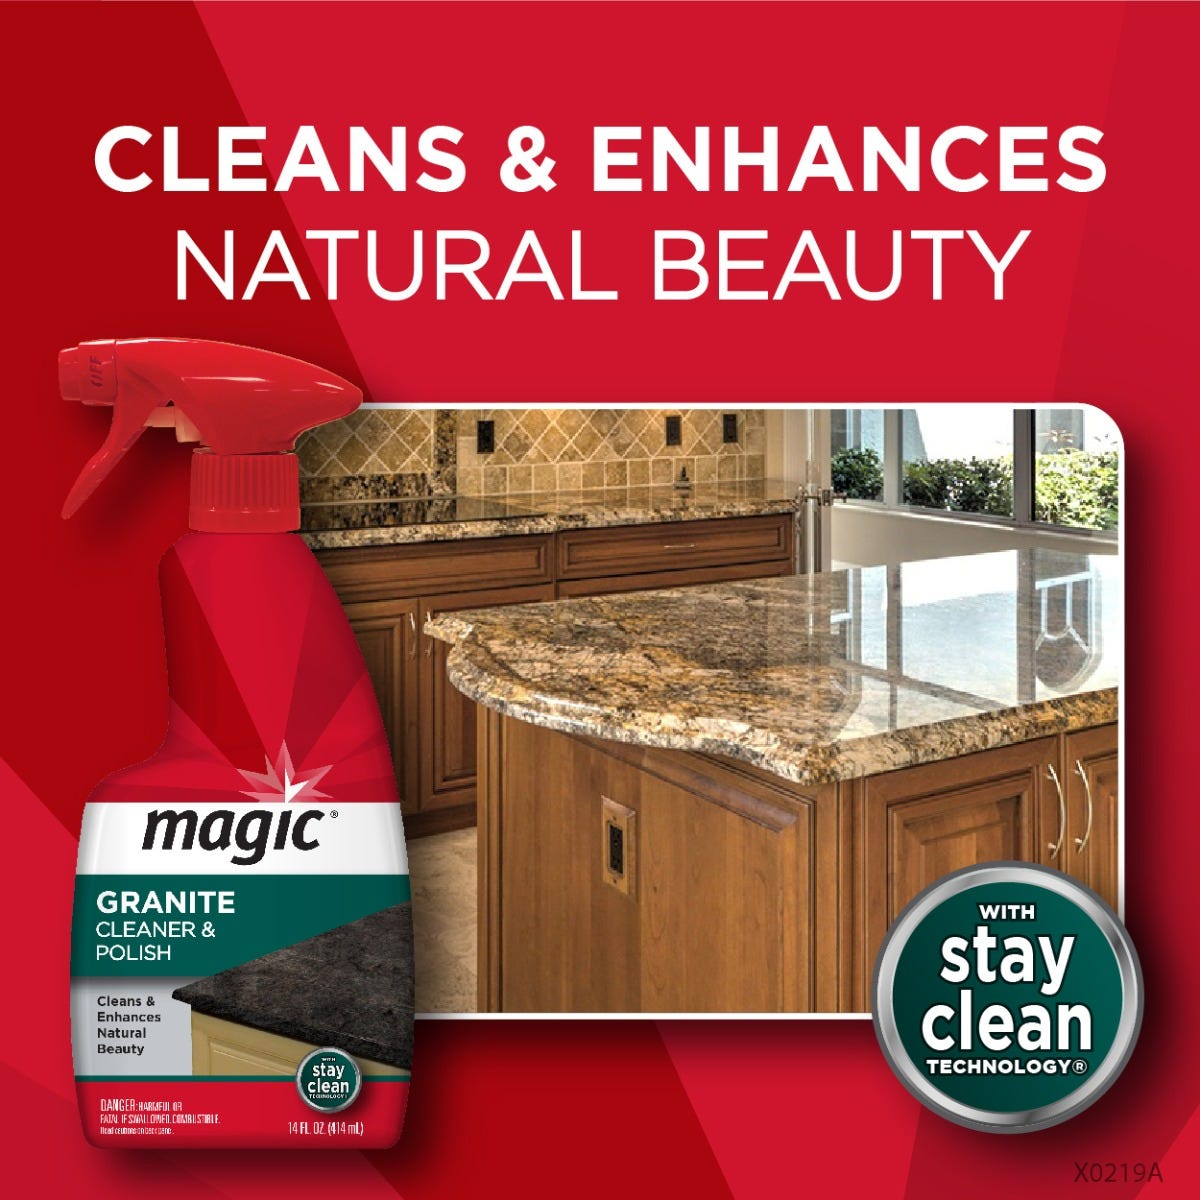 https://googone.com/media/catalog/product/m/a/magic_granite_cleaner_beauty_1_1.jpg